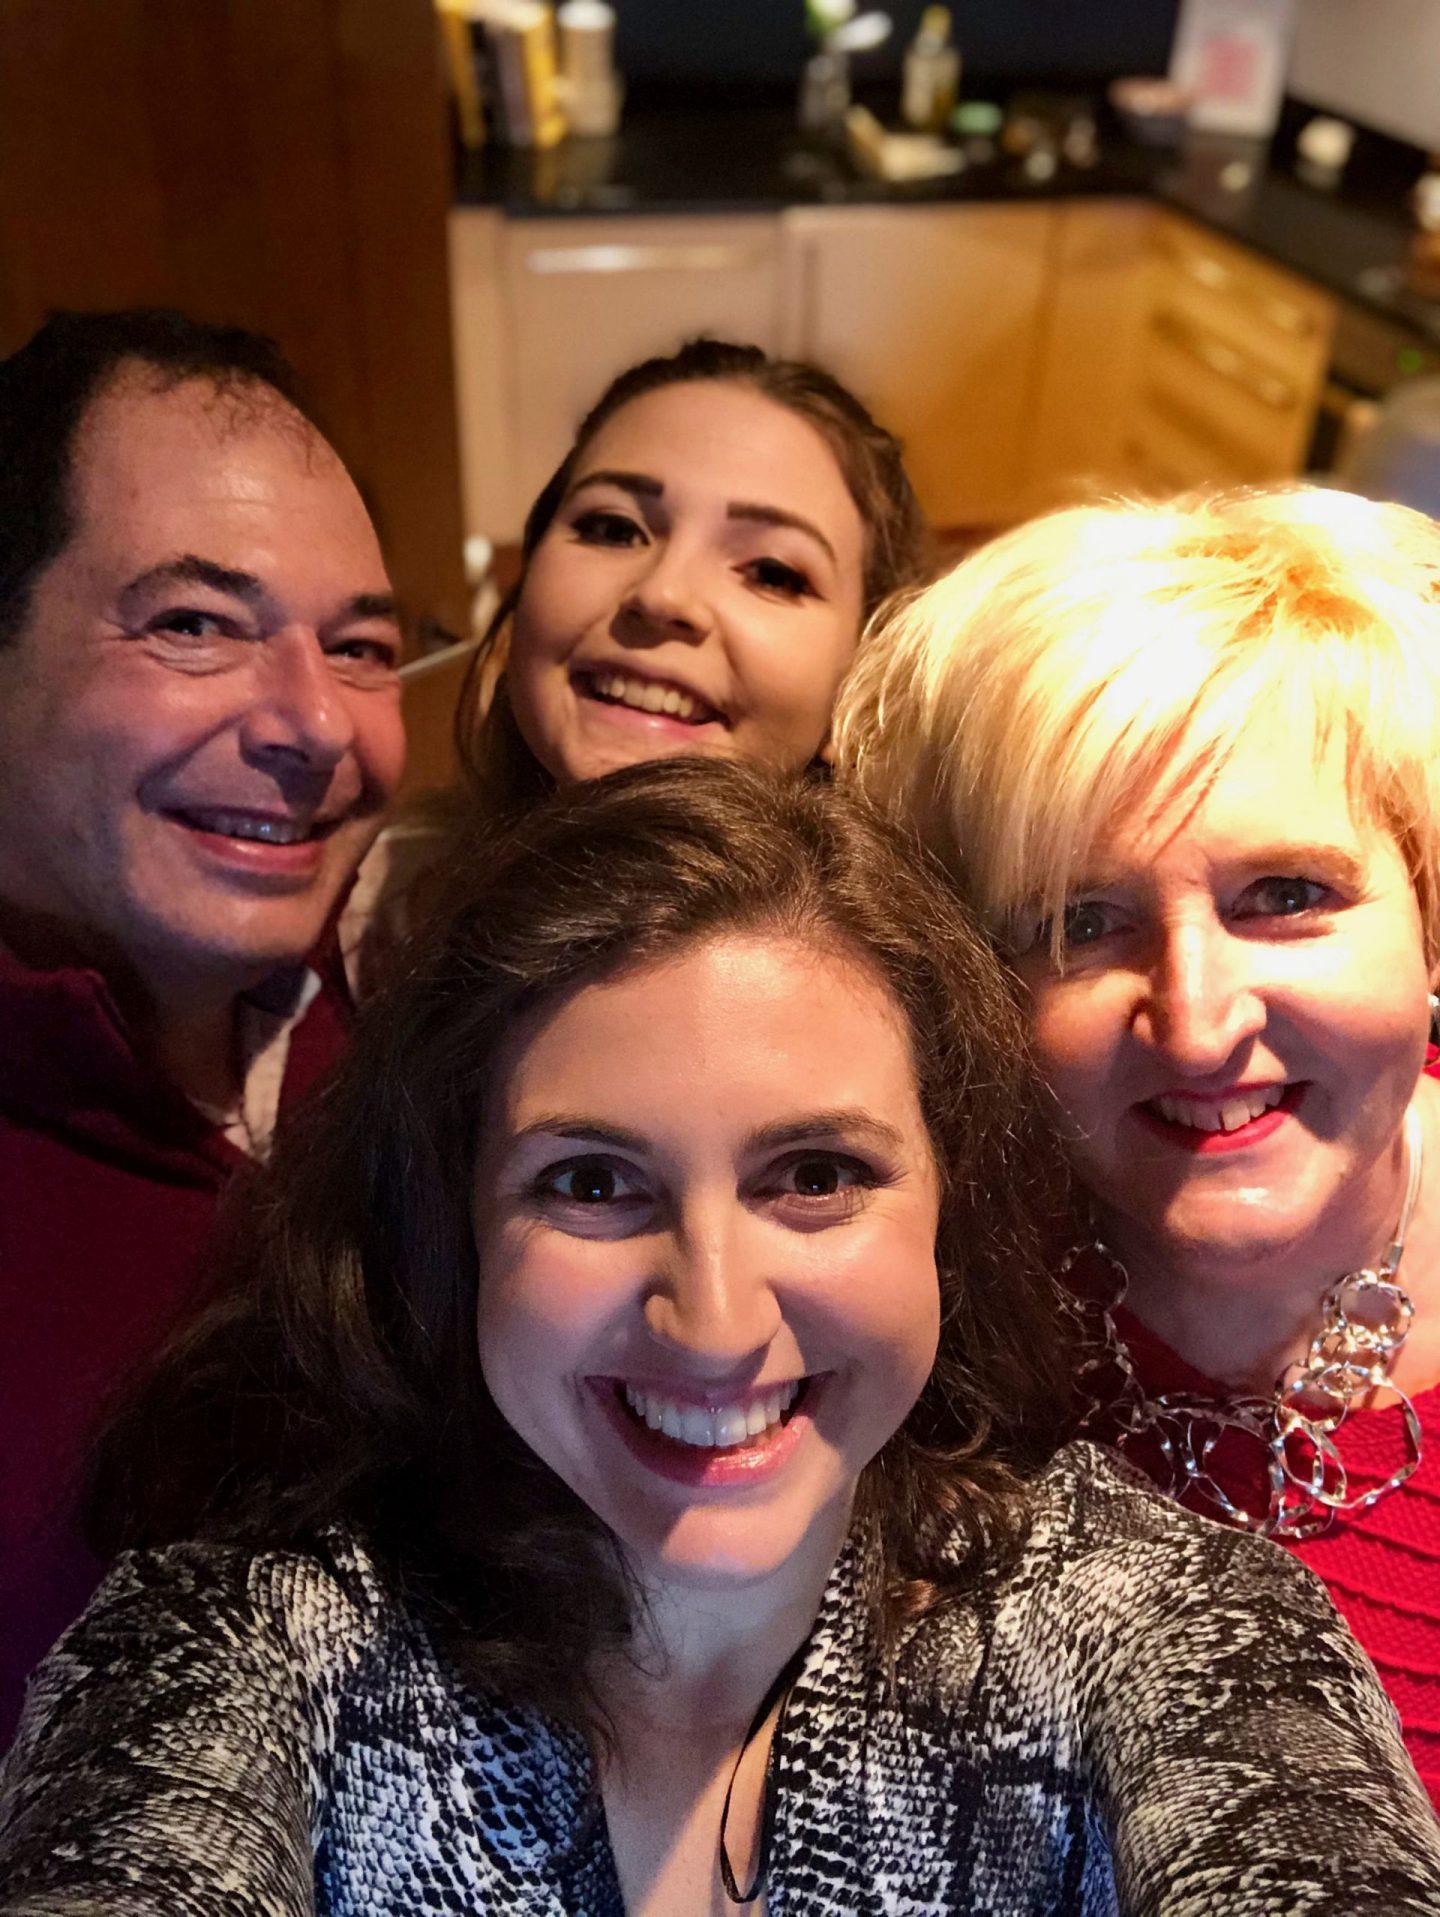 Practising gratitude during coronavirus: A selfie of Nell, her mum, her dad and her sister taken in her kitchen